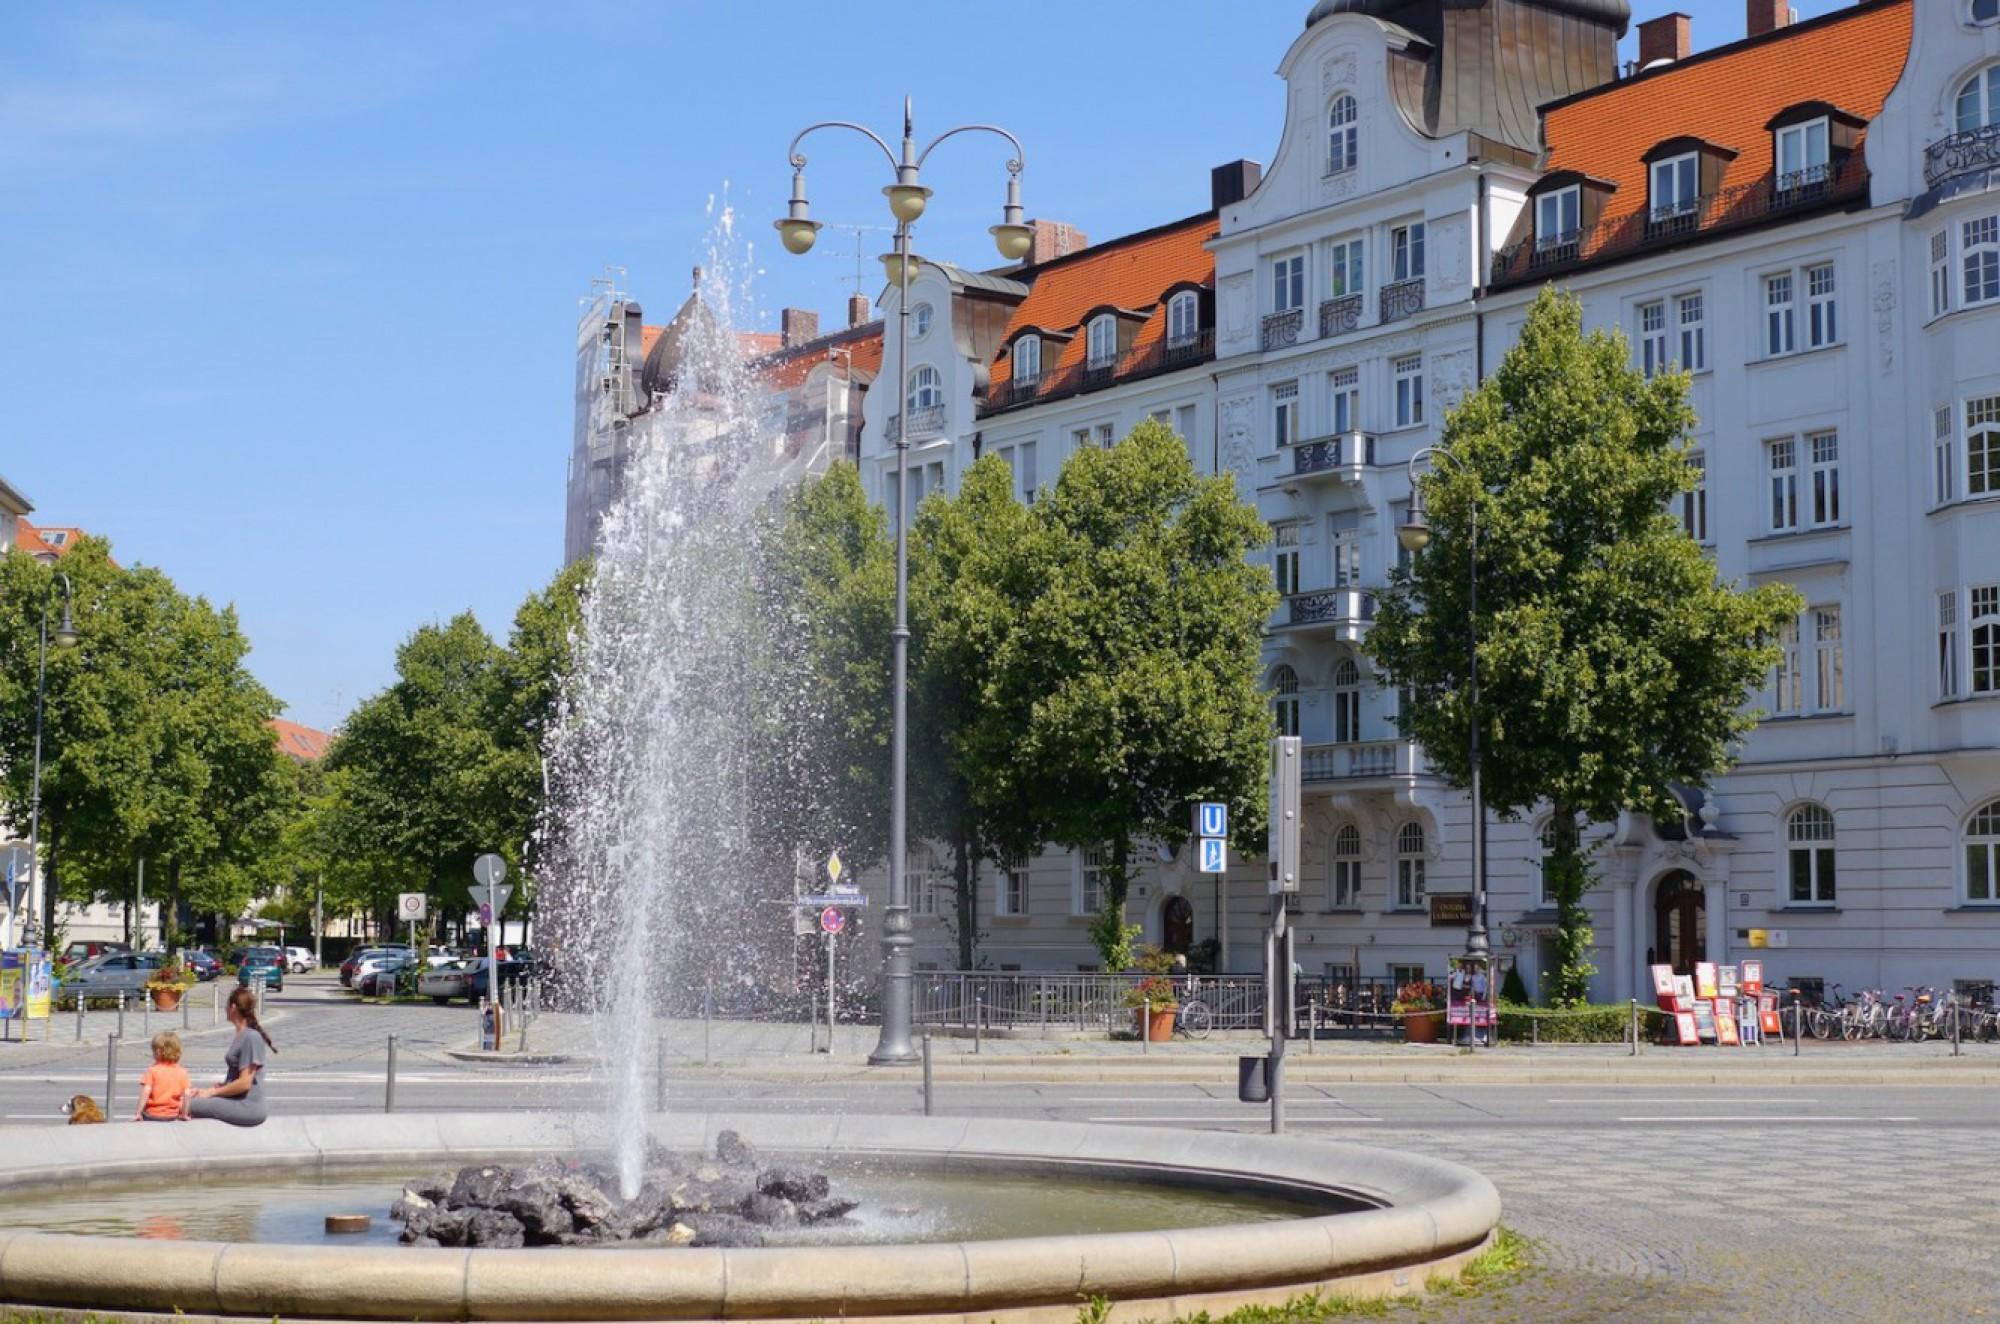 3 Gehminuten vom Prinzregentenplatz (U4)